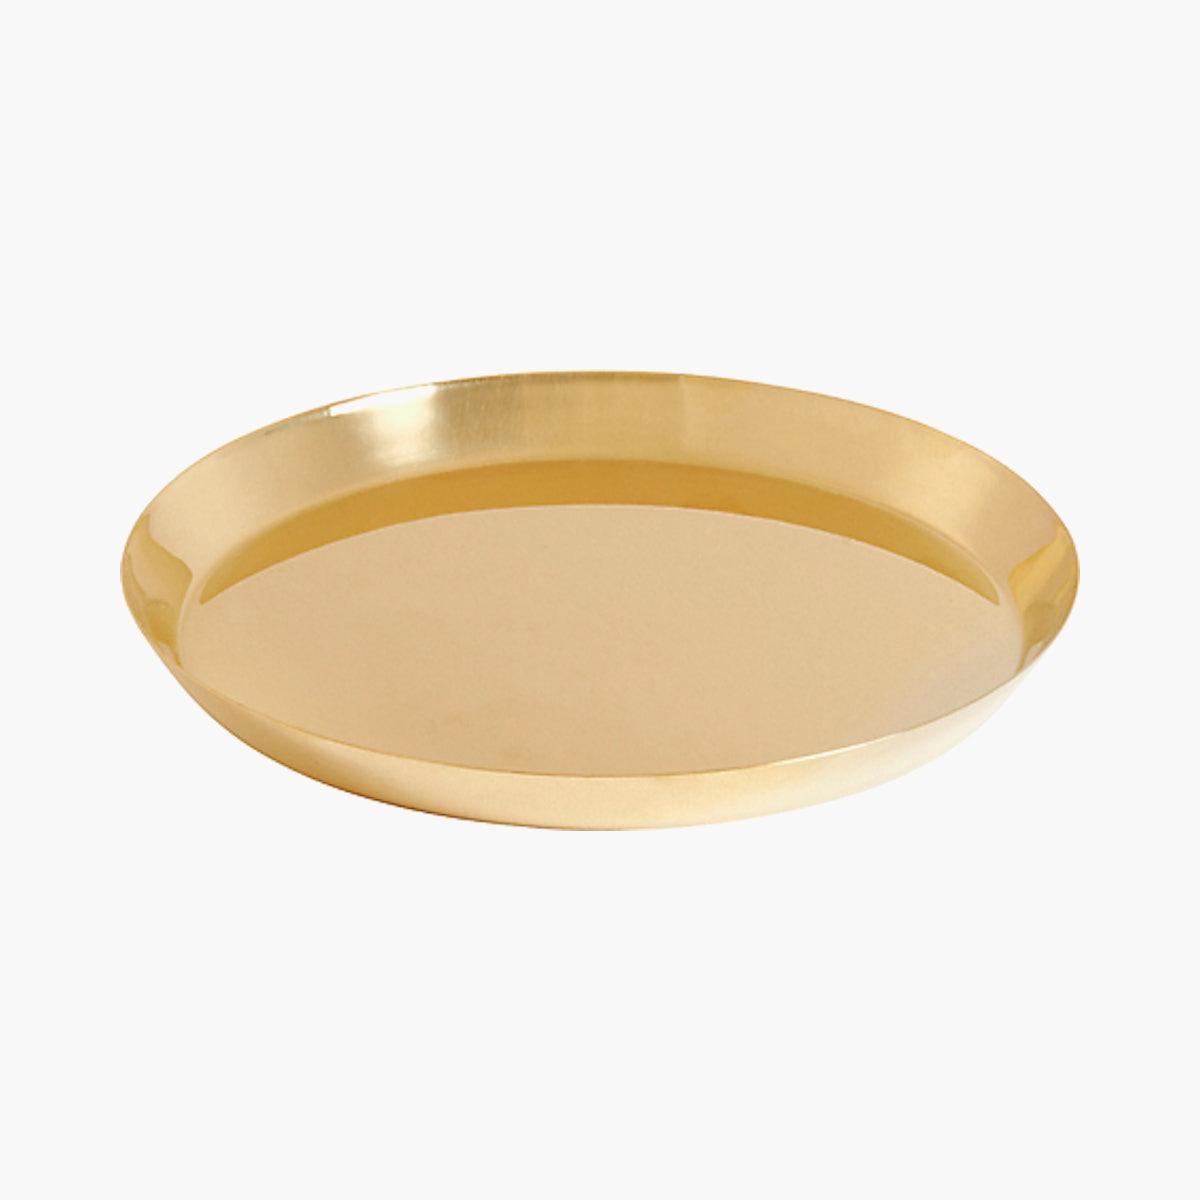 Botanical Family Saucer - Brass